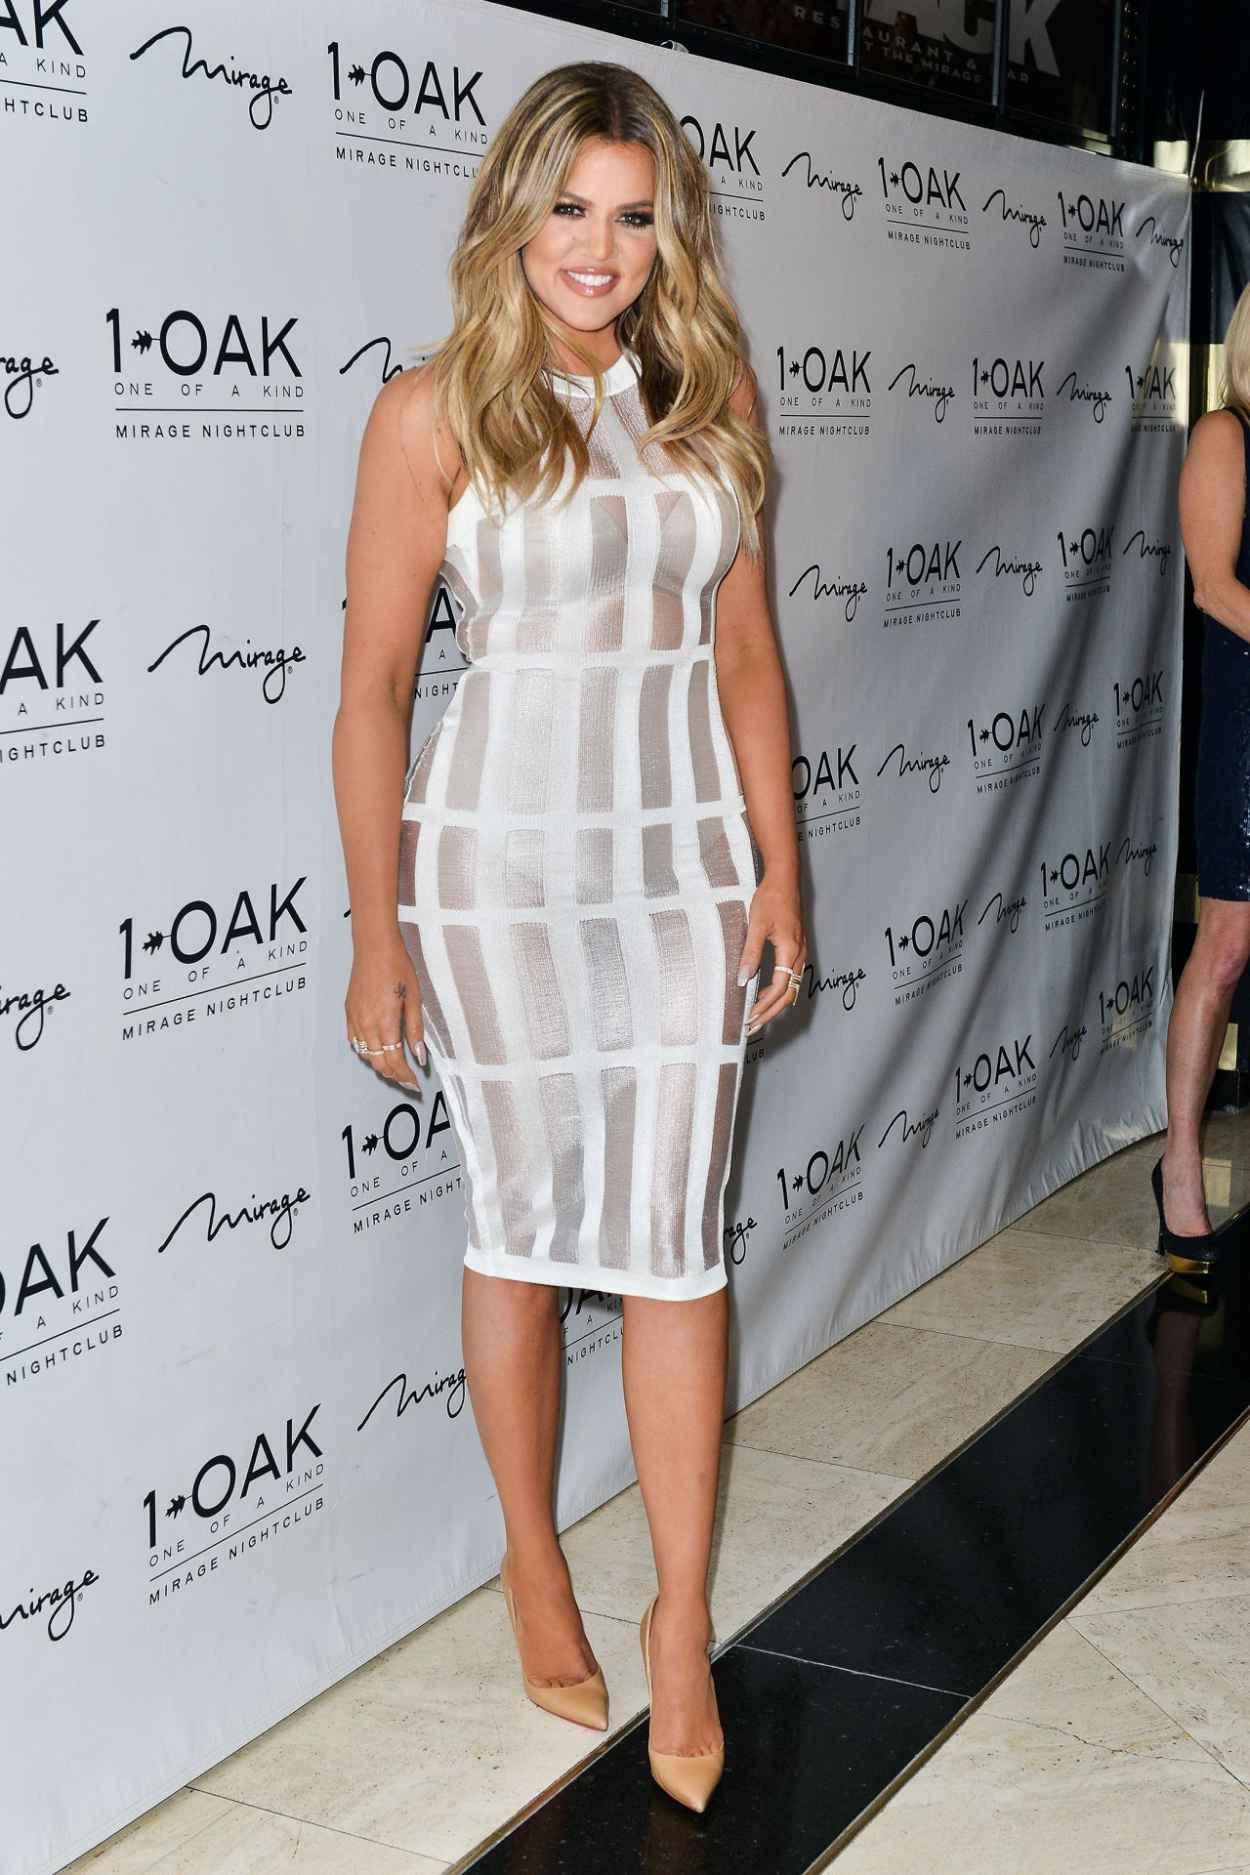 Khloe Kardashian at 1OAK NigthClub in Las Vegas - March 2015-1